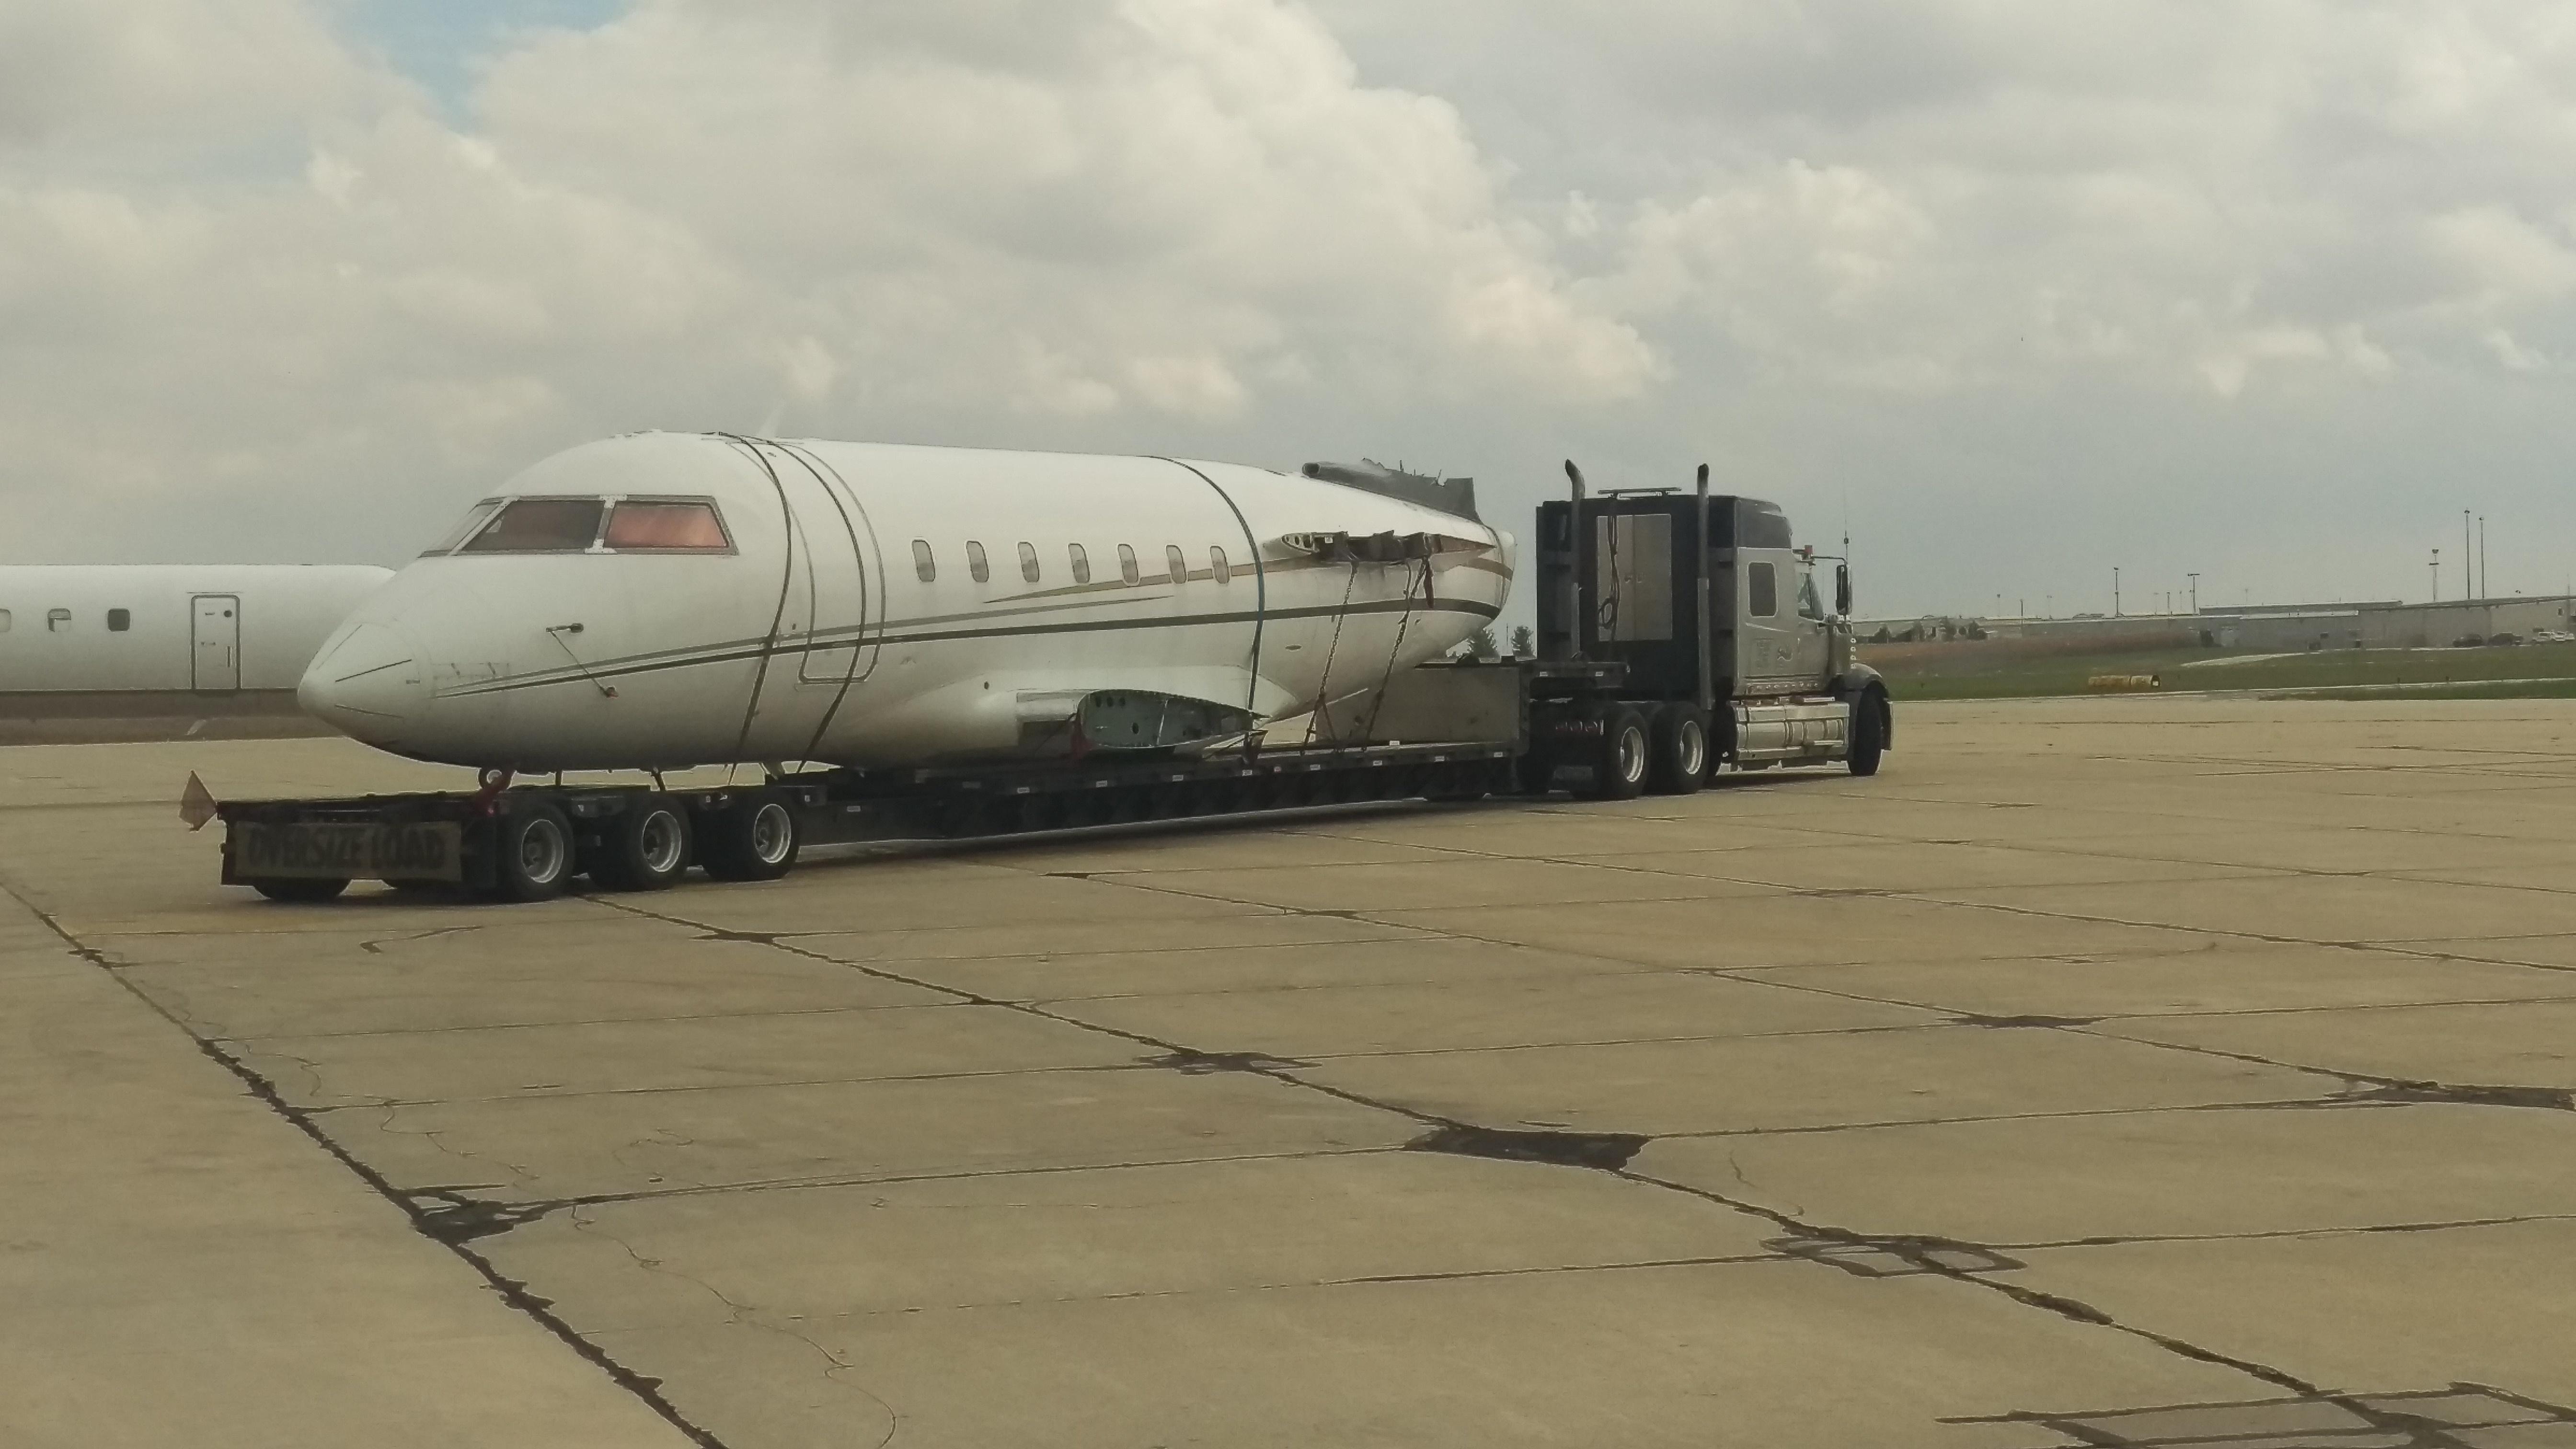 Plane Tranportation Service